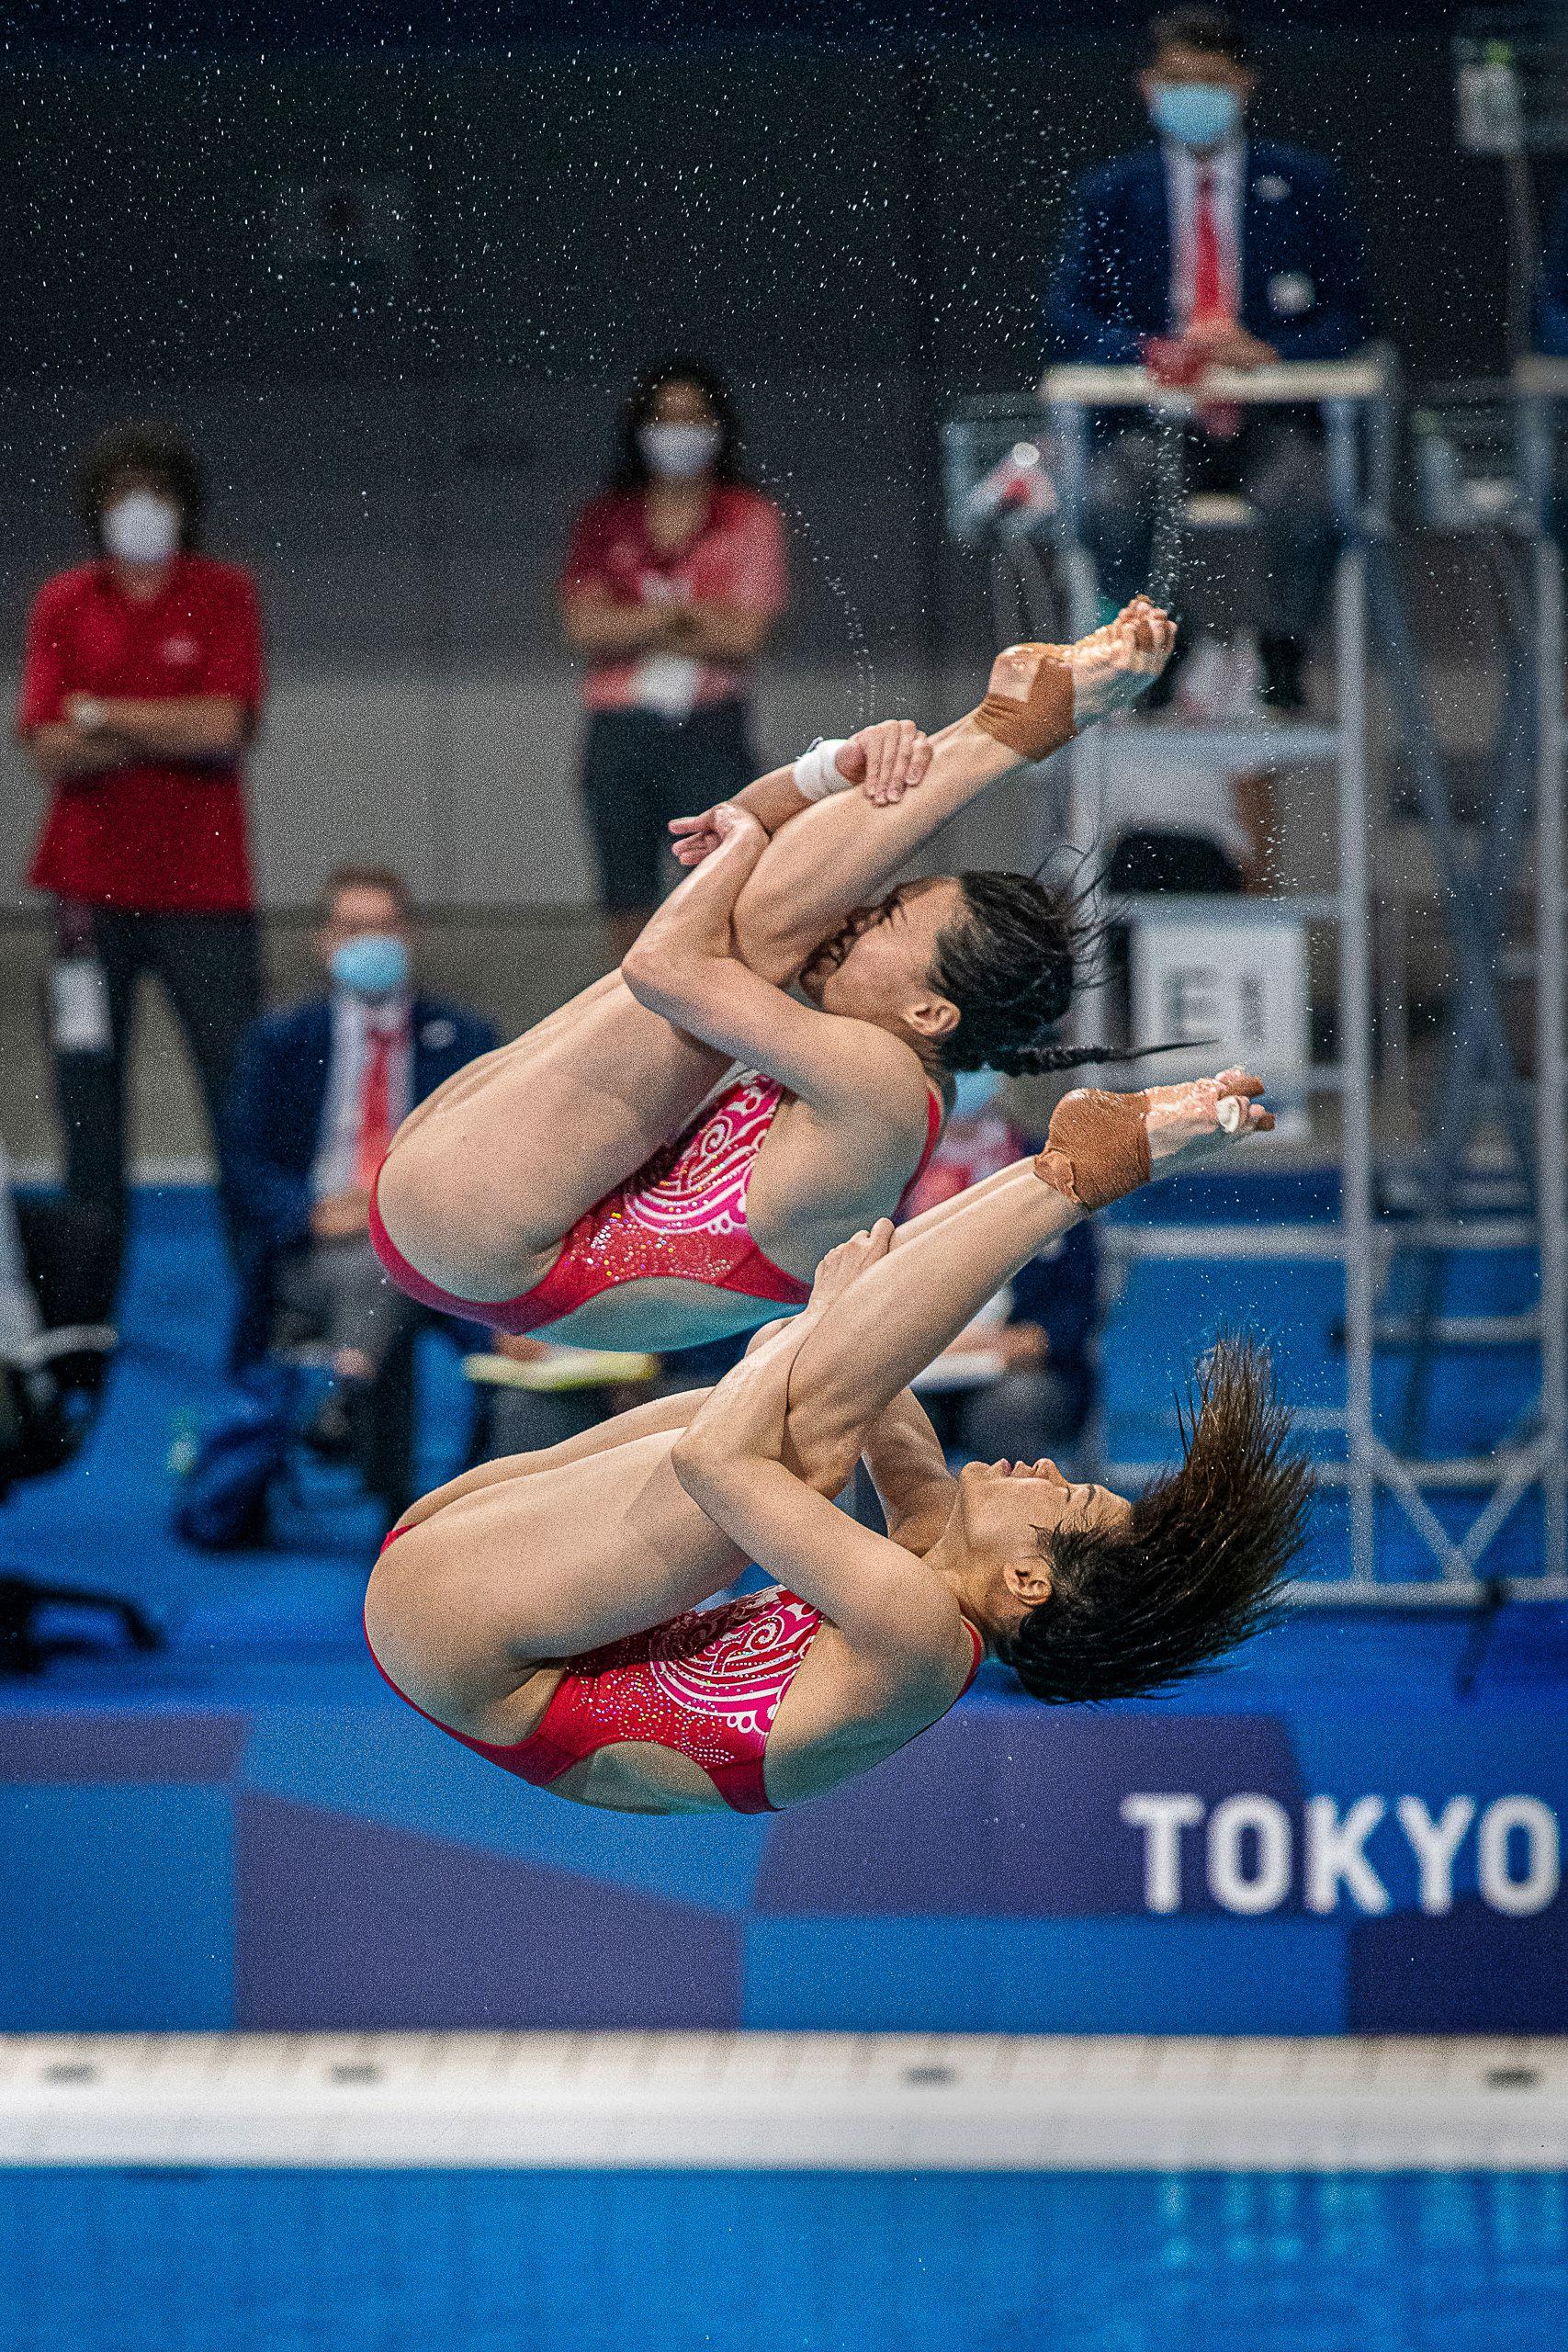 Japan_Tokyo_Olympics_6073.jpg